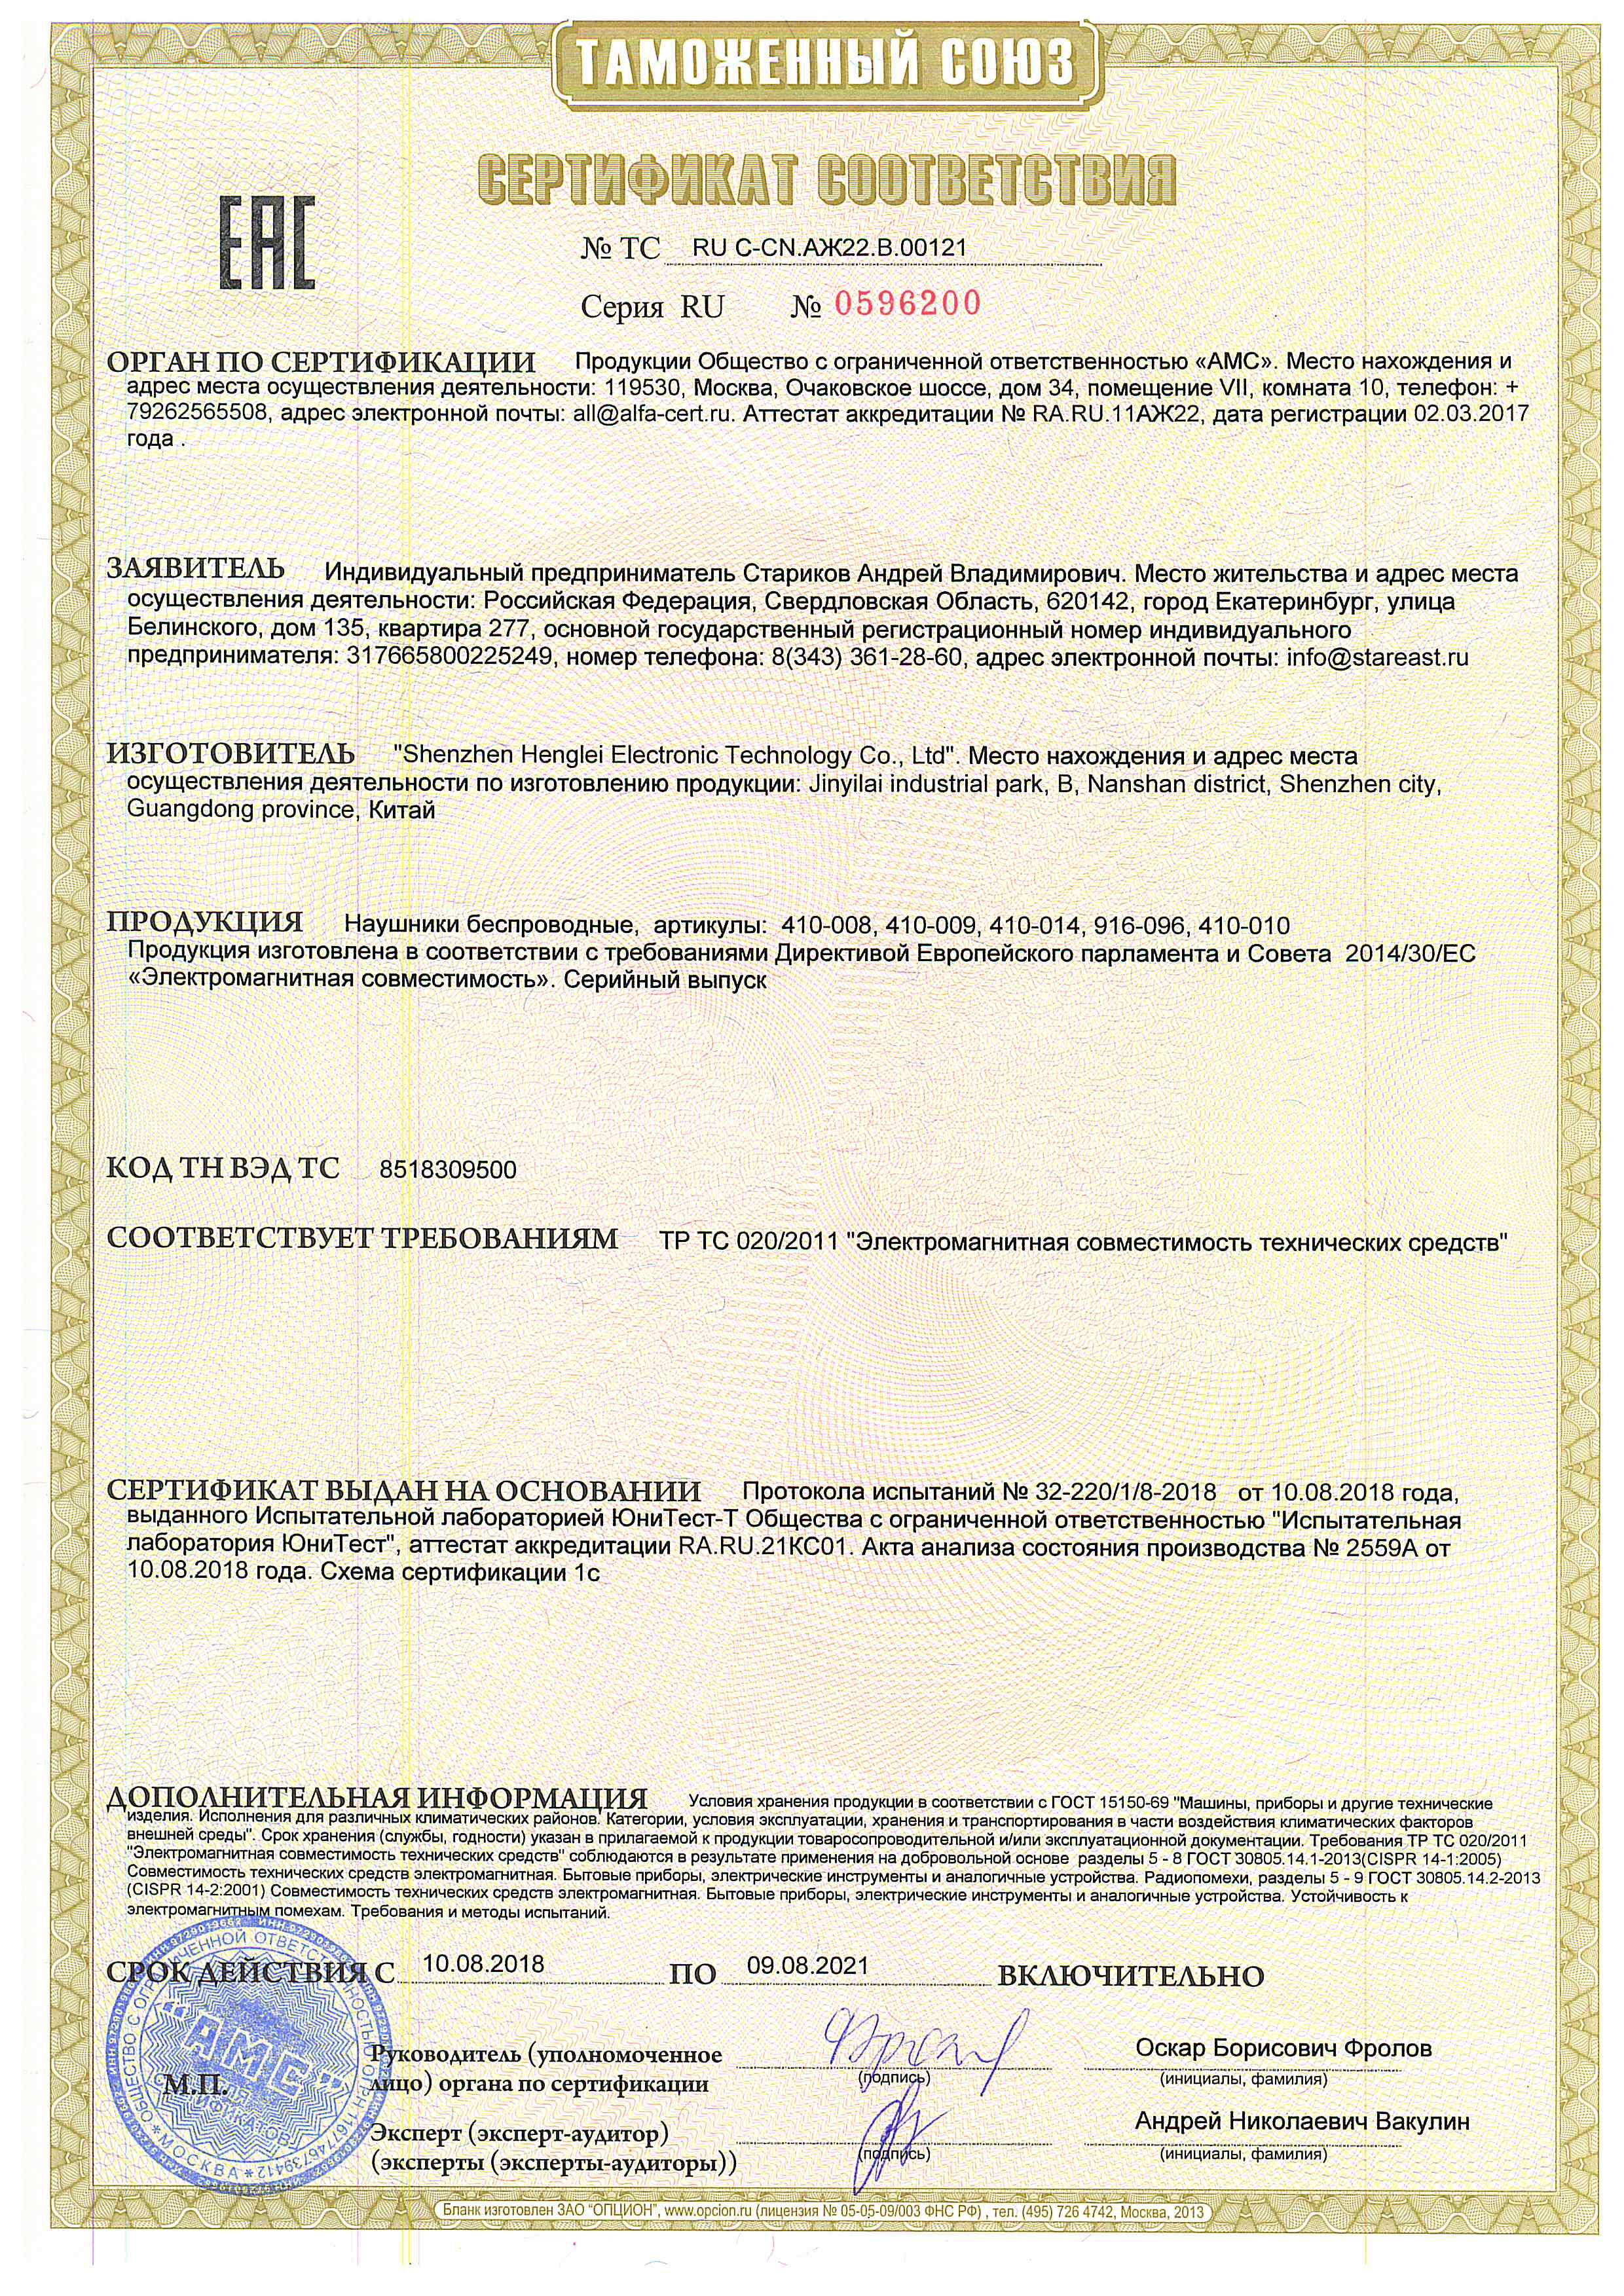 RUS-CN.AZh22.V.00121.jpg